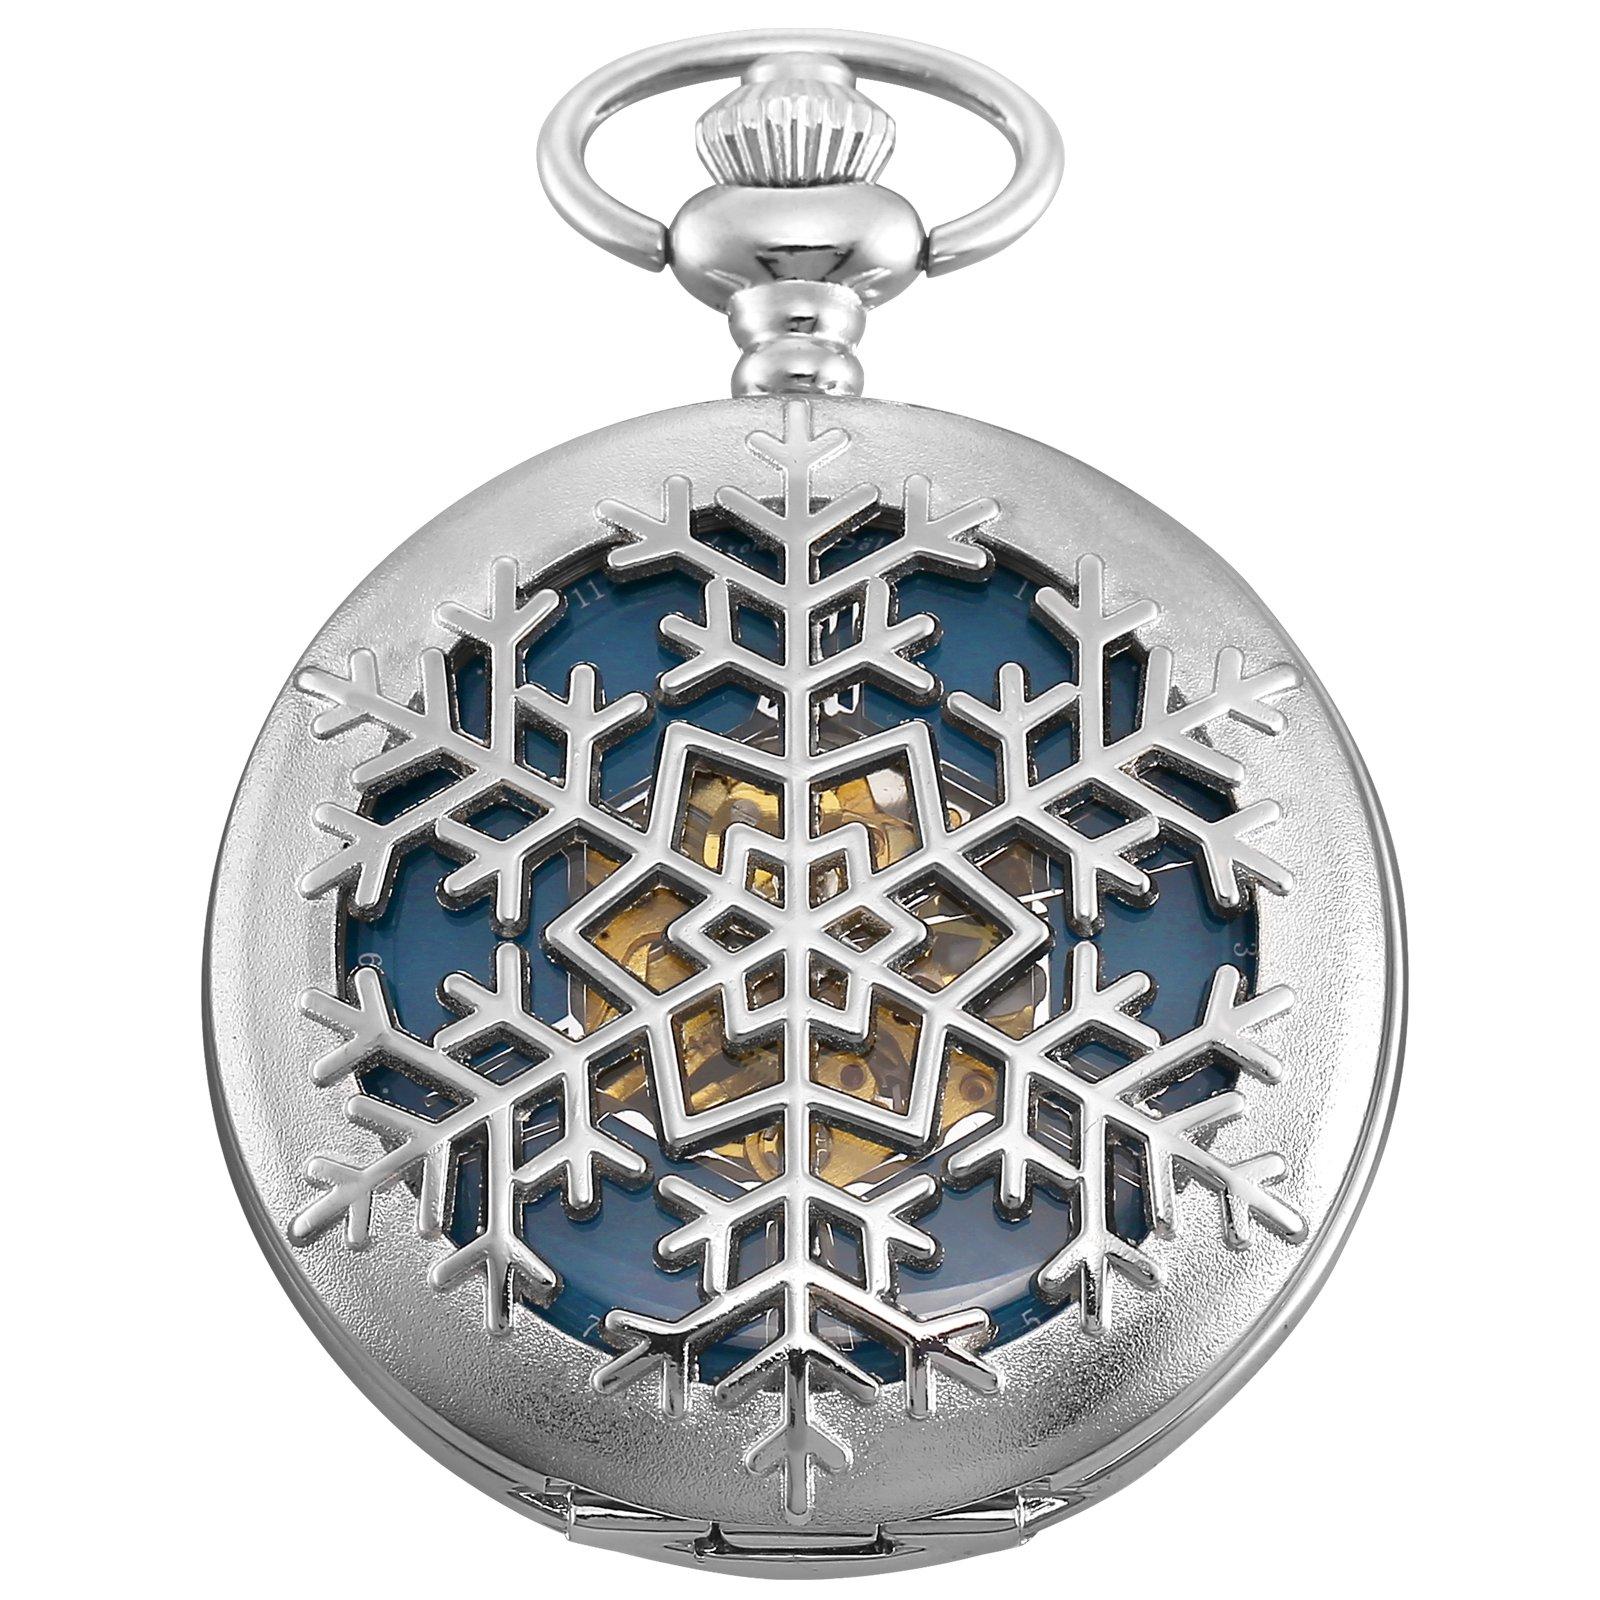 KS Skeleton Snow Flake Design Case Roman Numeral Markers Mechanical Pocket Watch KSP101